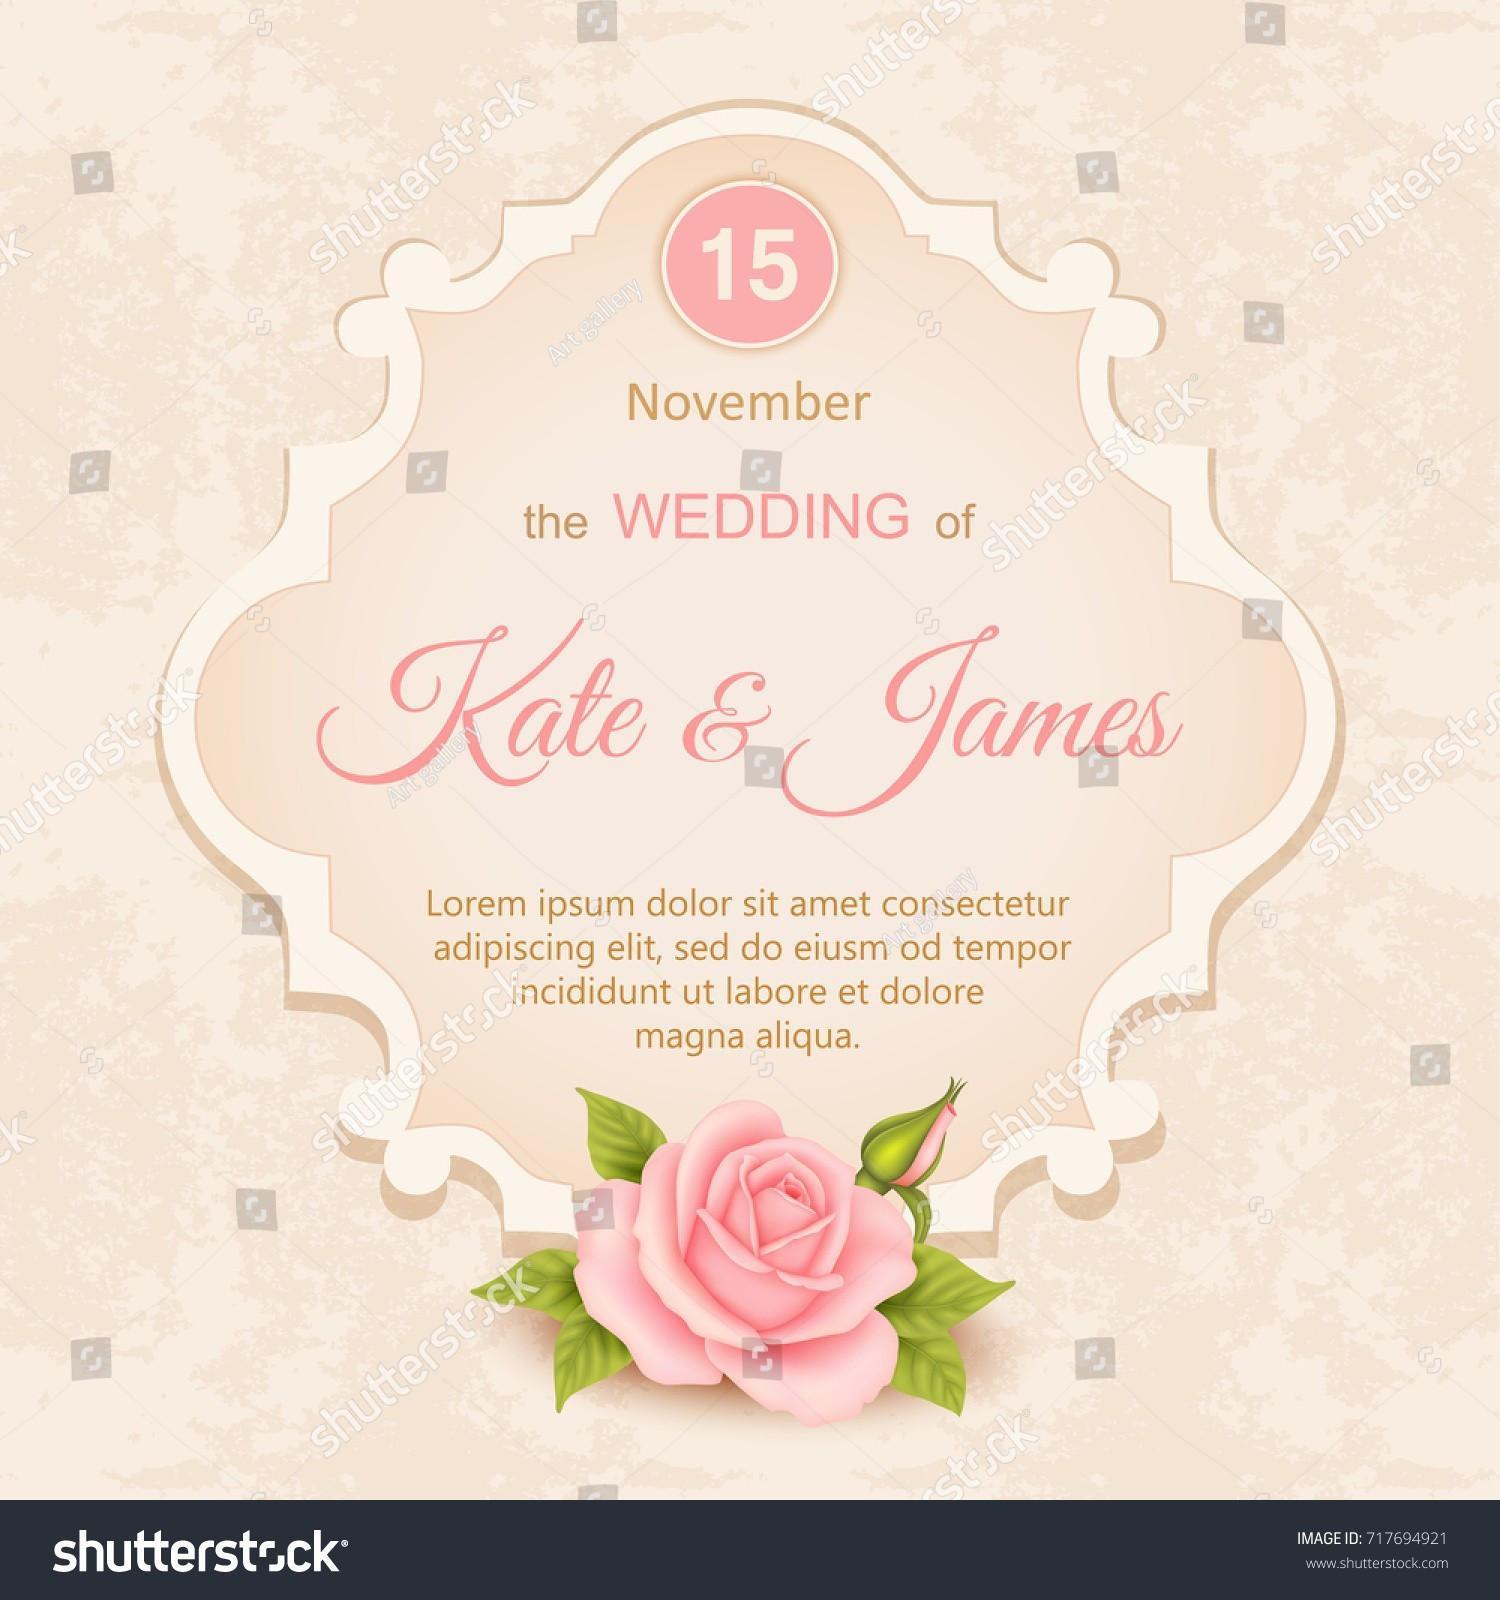 Free Bridesmaid Luncheon Invitation Templates